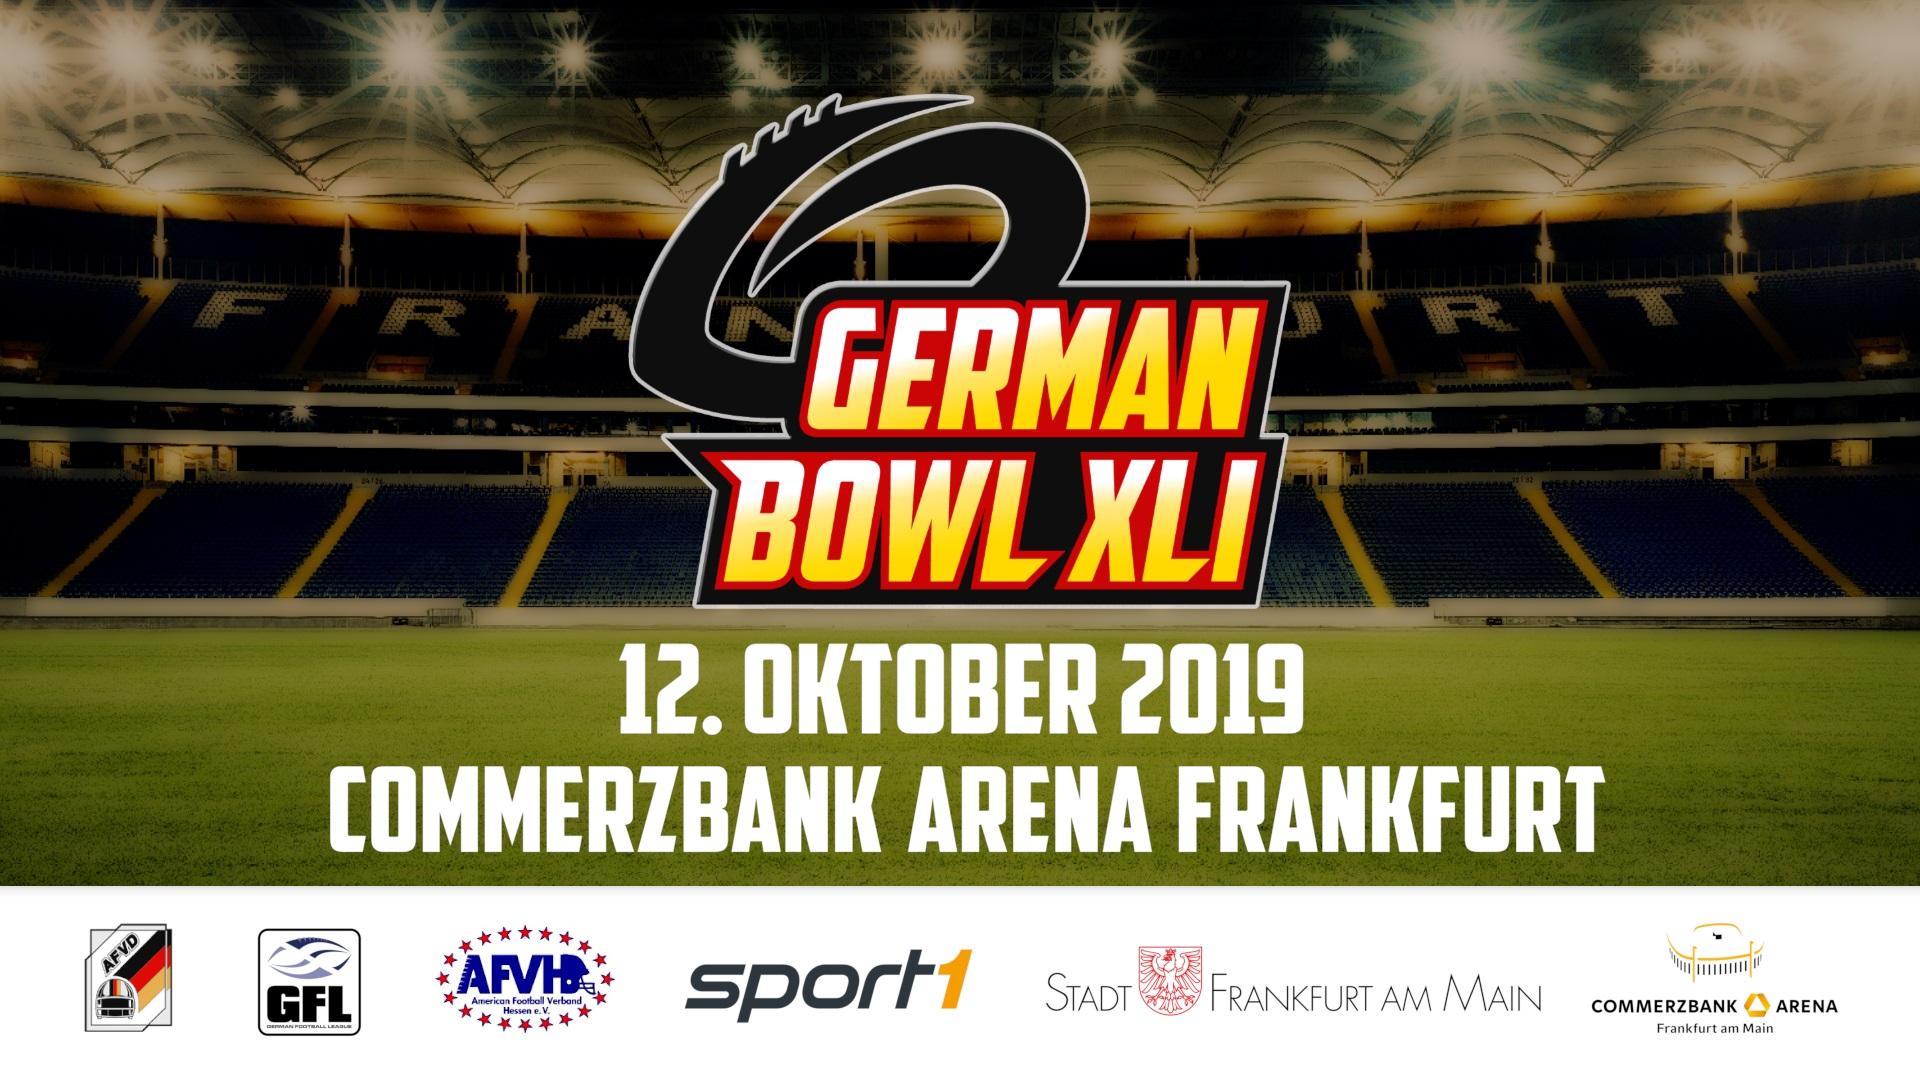 German Bowl XLI Header